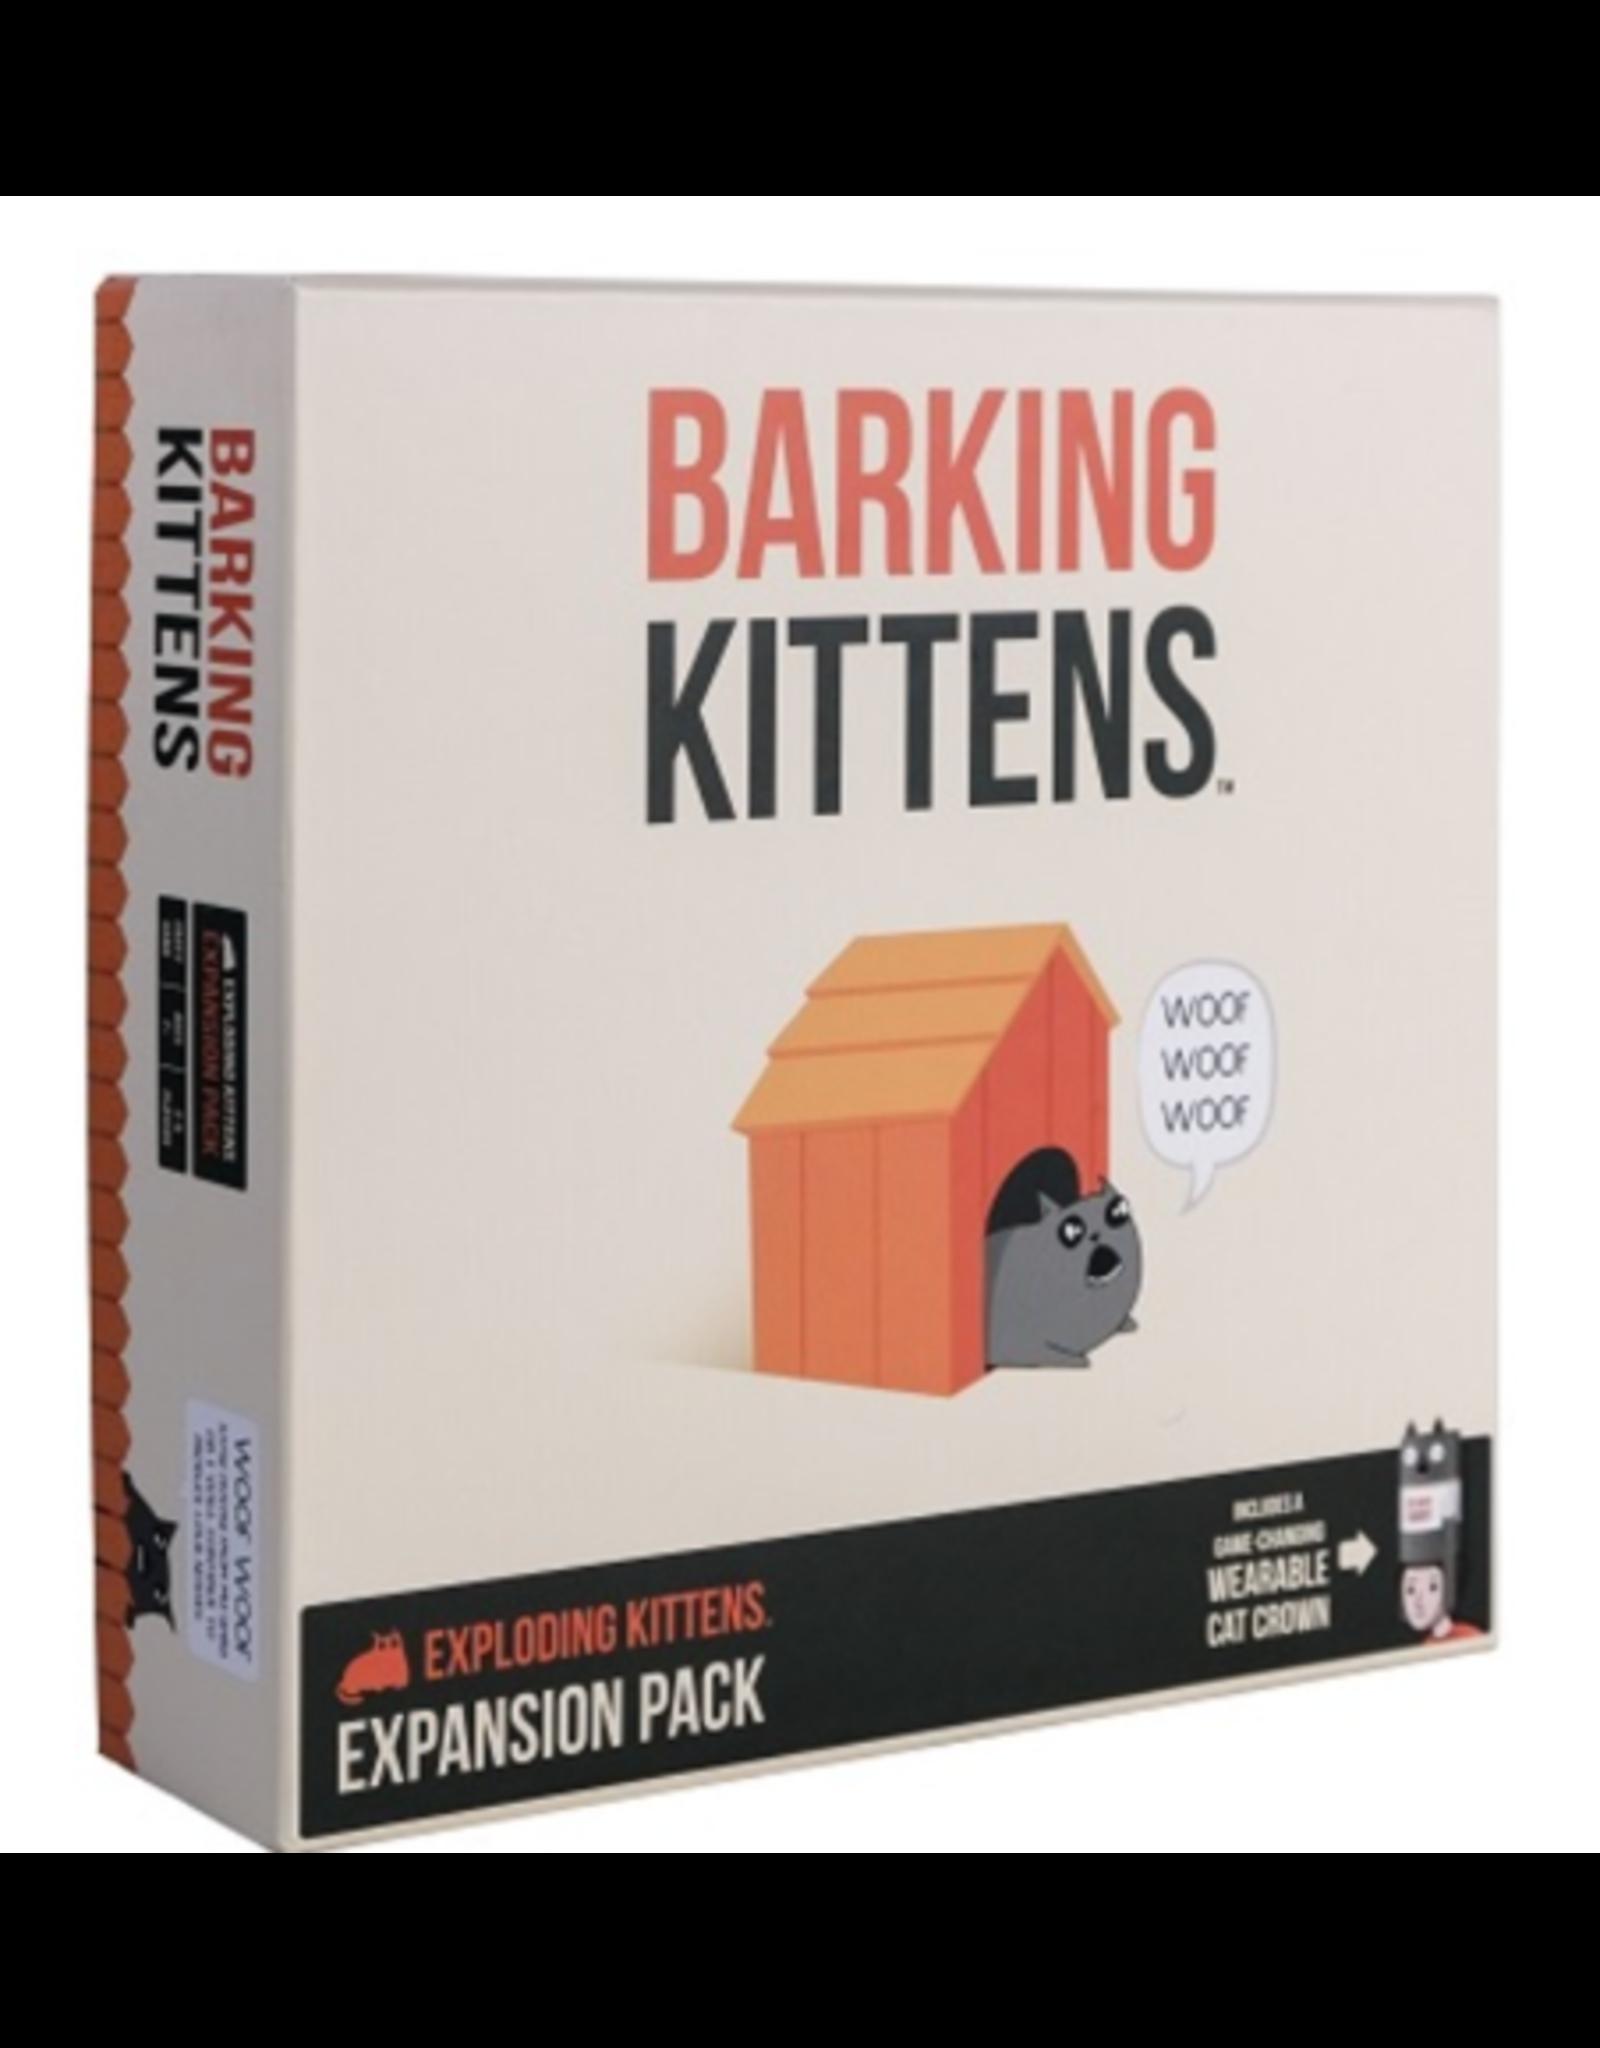 Exploding Kittens Barking Kittens - Exploding Kittens Expansion